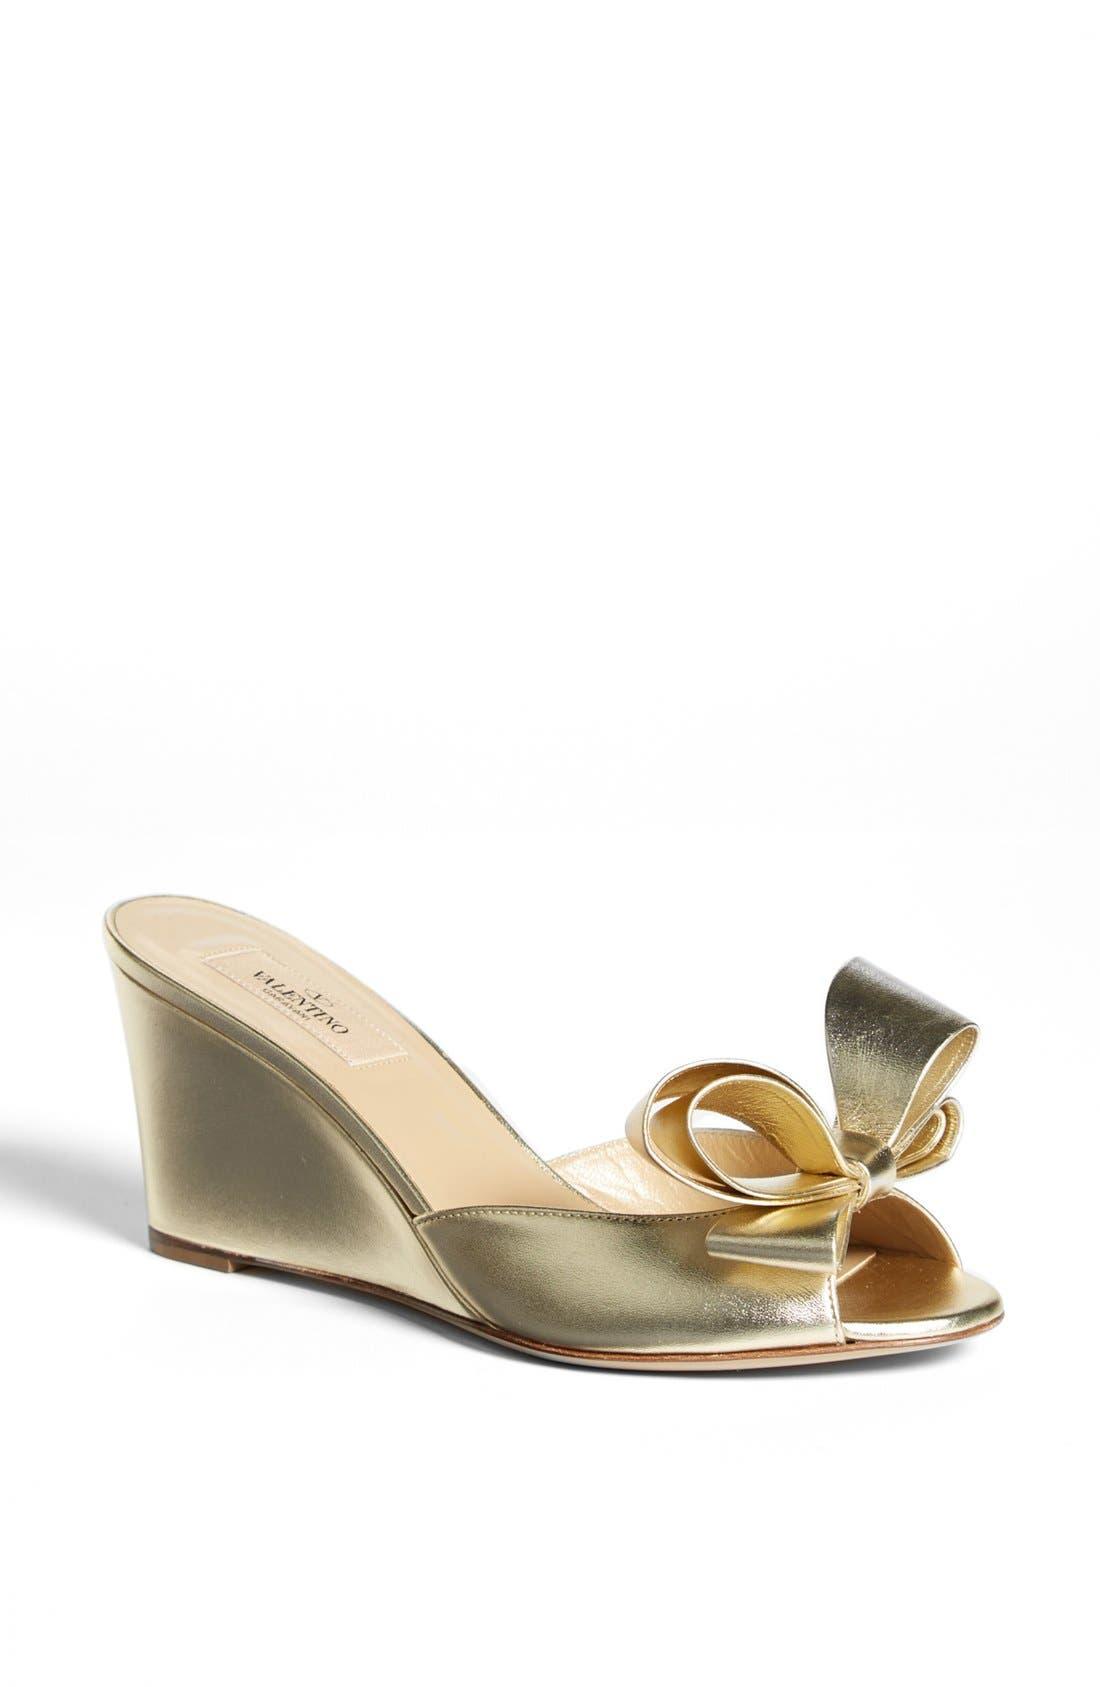 Main Image - VALENTINO GARAVANI Bow Wedge Sandal